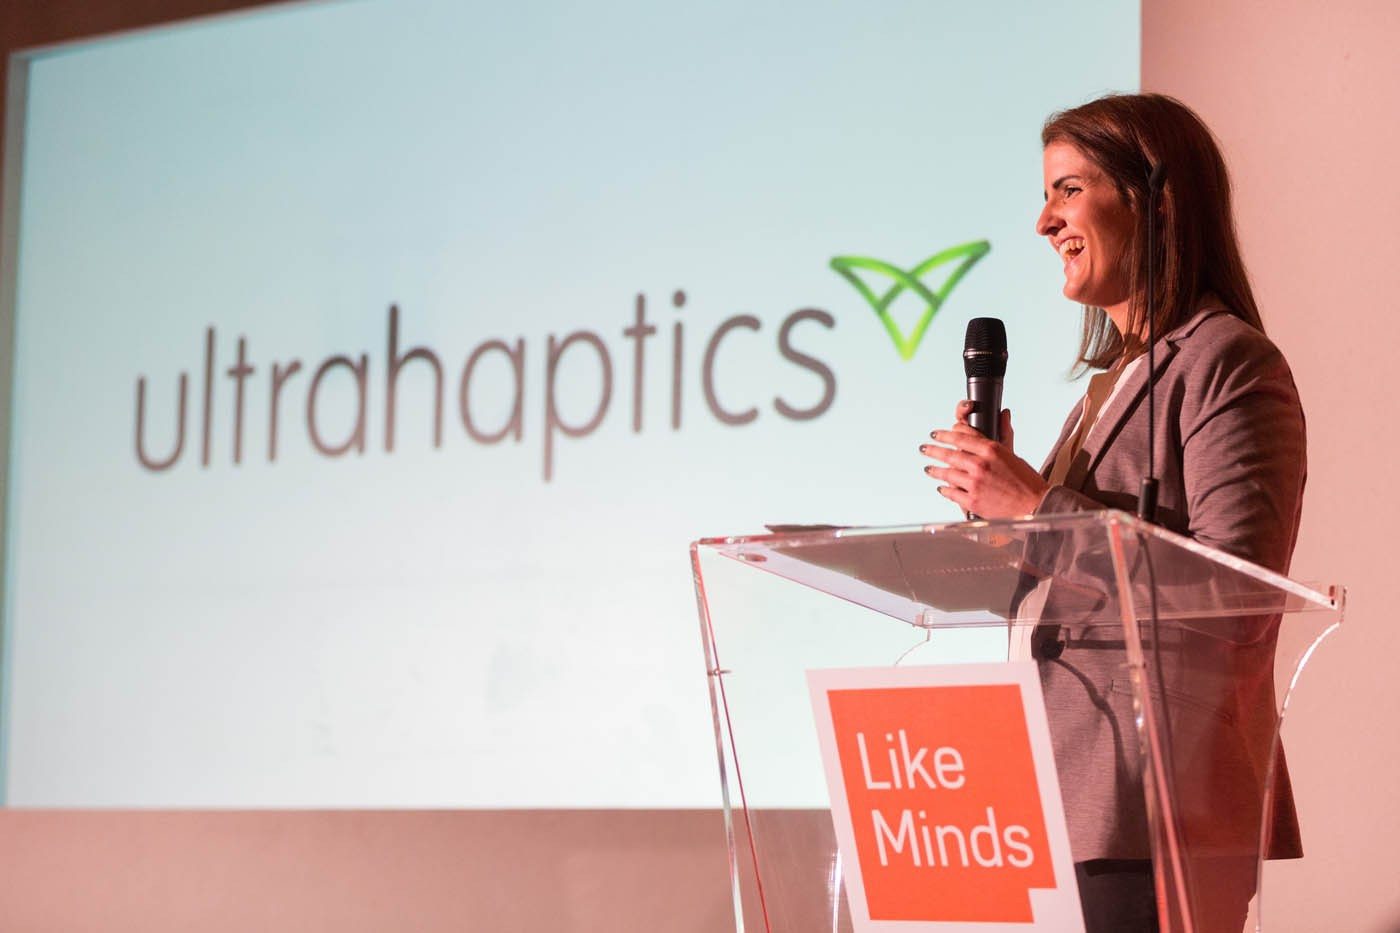 Ruth Millar – Ultrahaptics